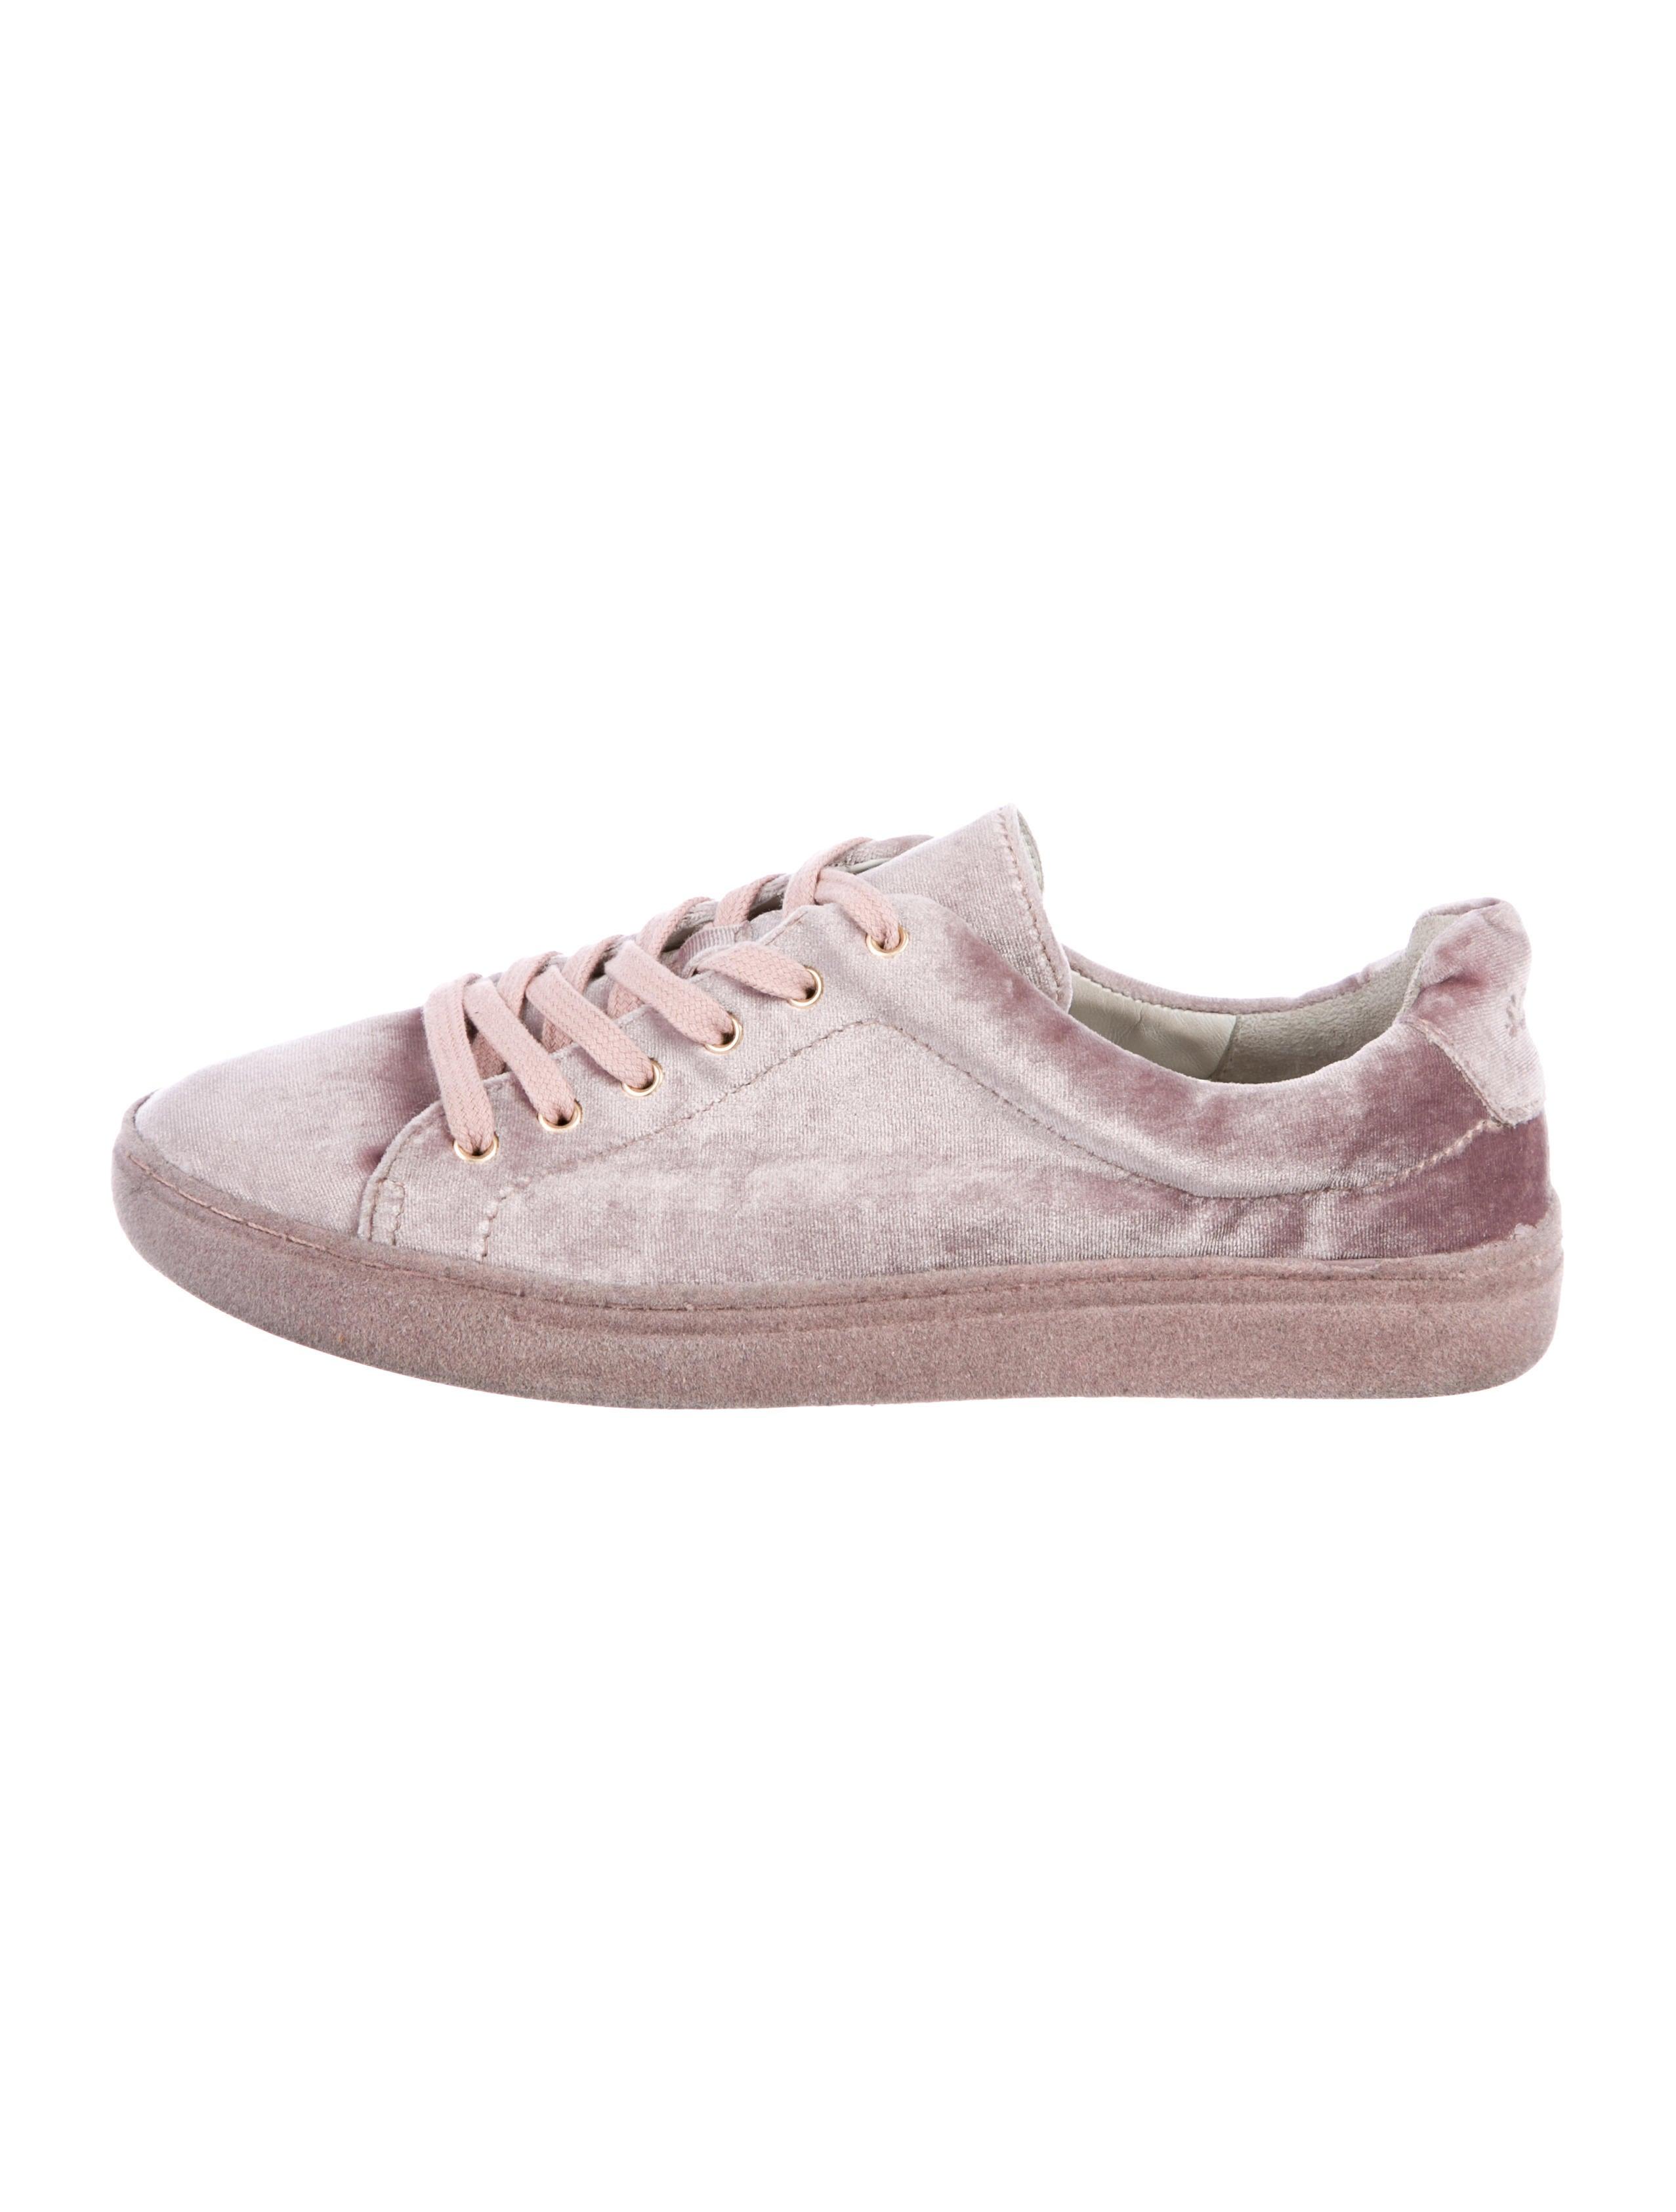 cheap best place Schutz Velvet Low-Top Sneakers purchase wholesale price cheap sale cost Q73NL7